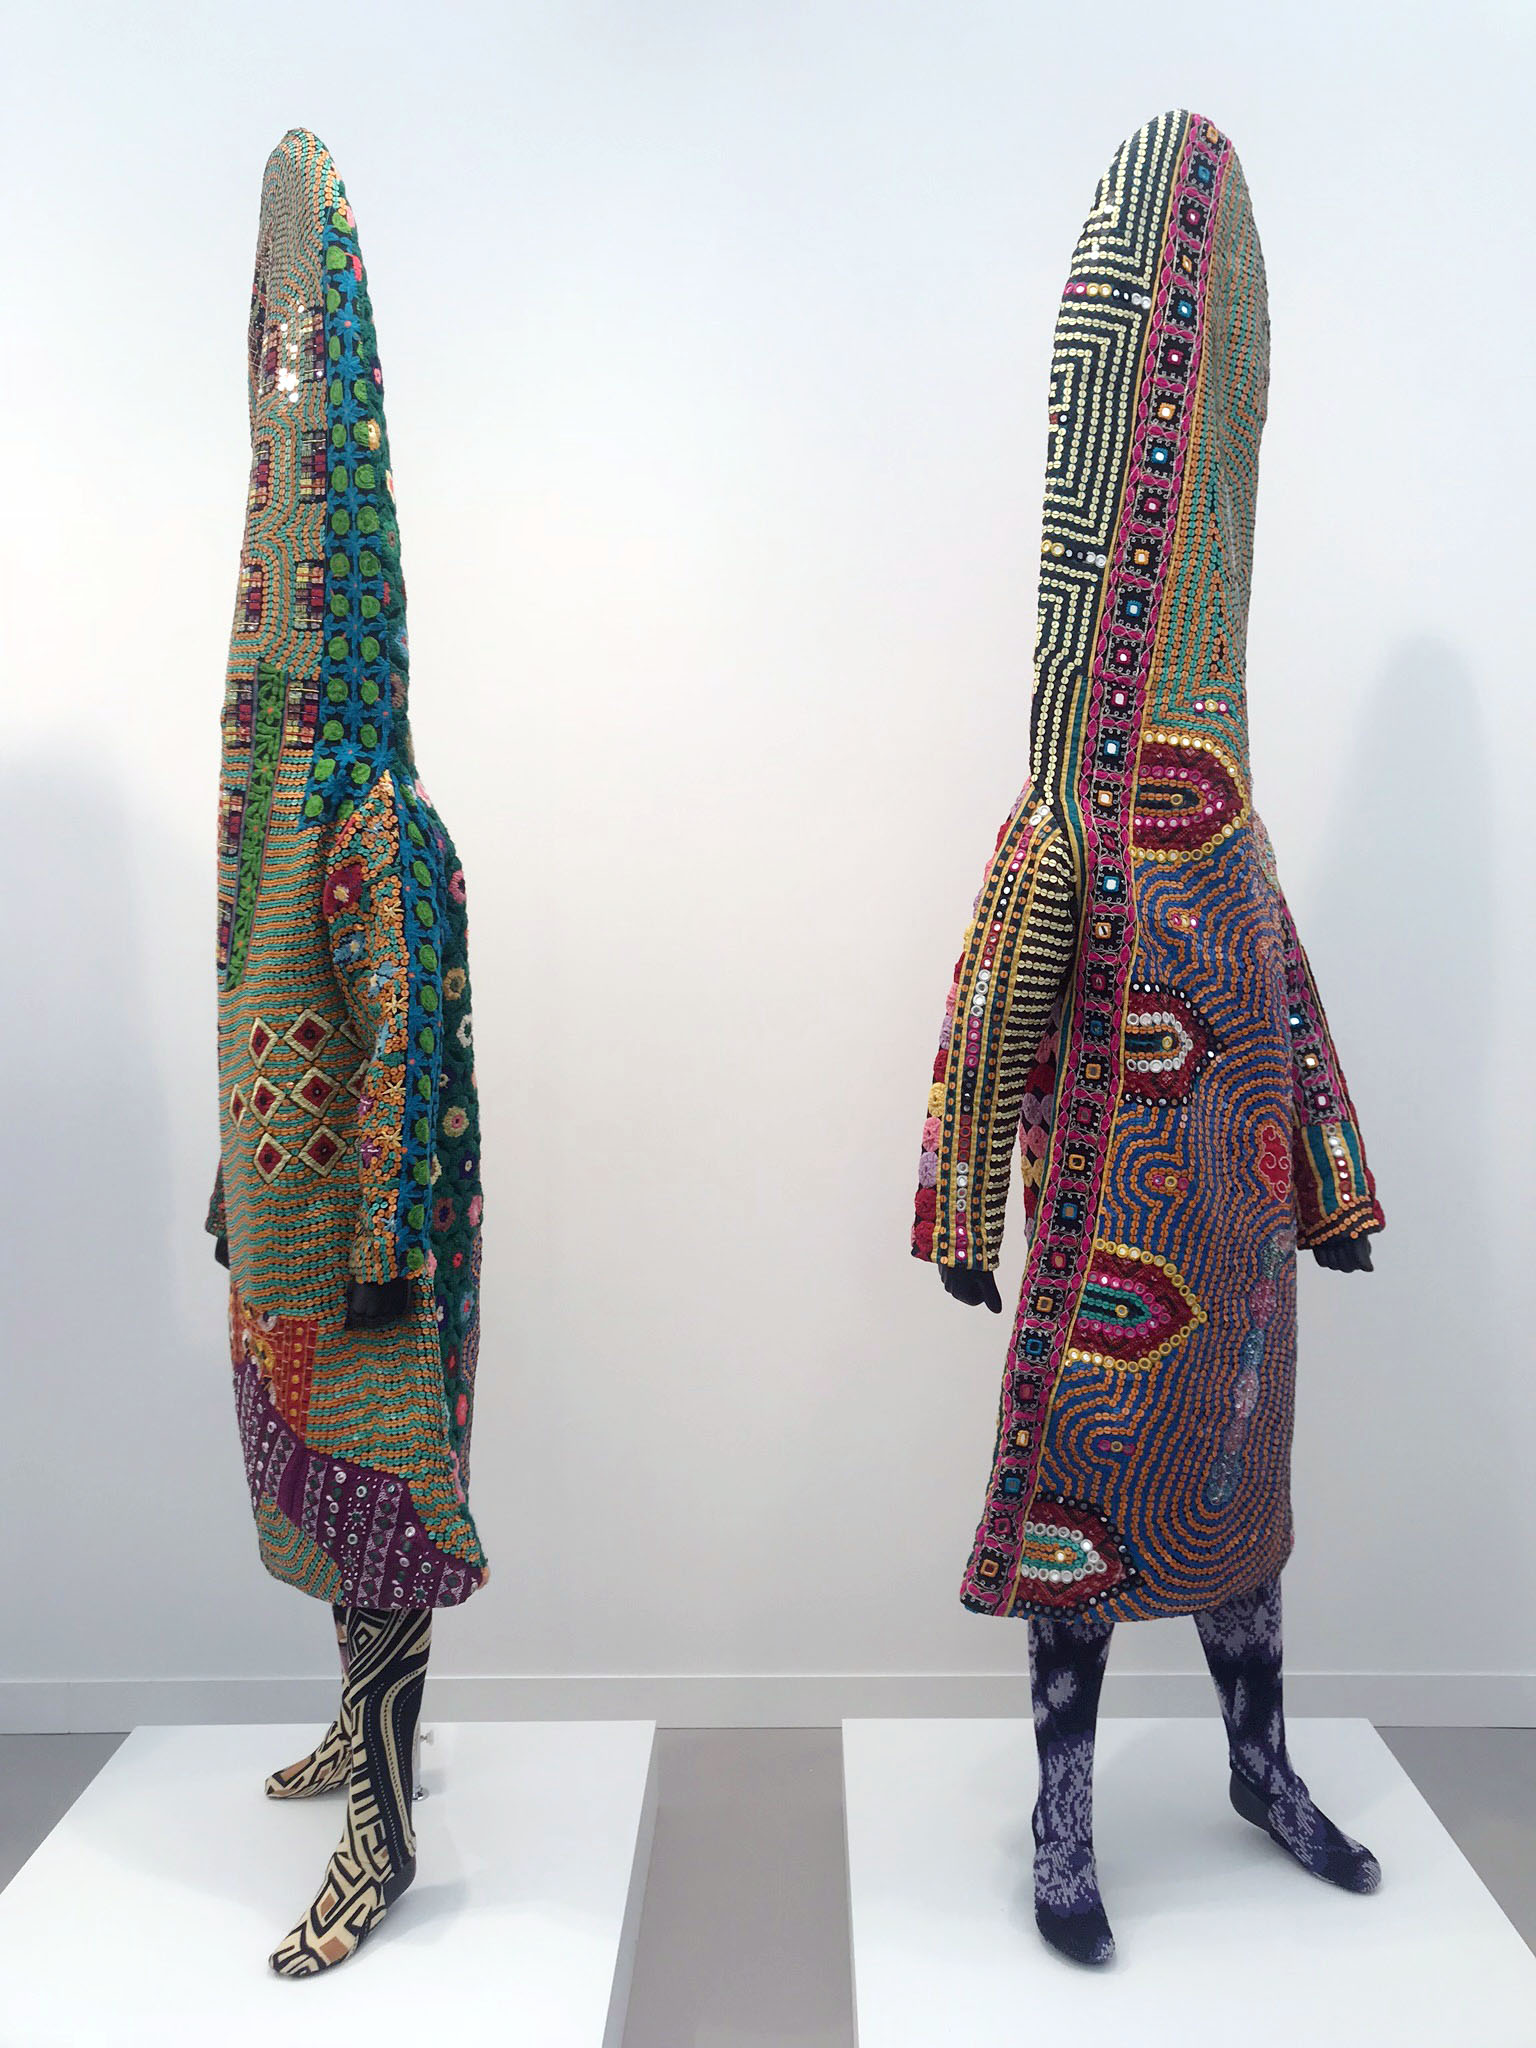 Nick Cave, Souundsuits, 2018, Jack Shainman Gallery